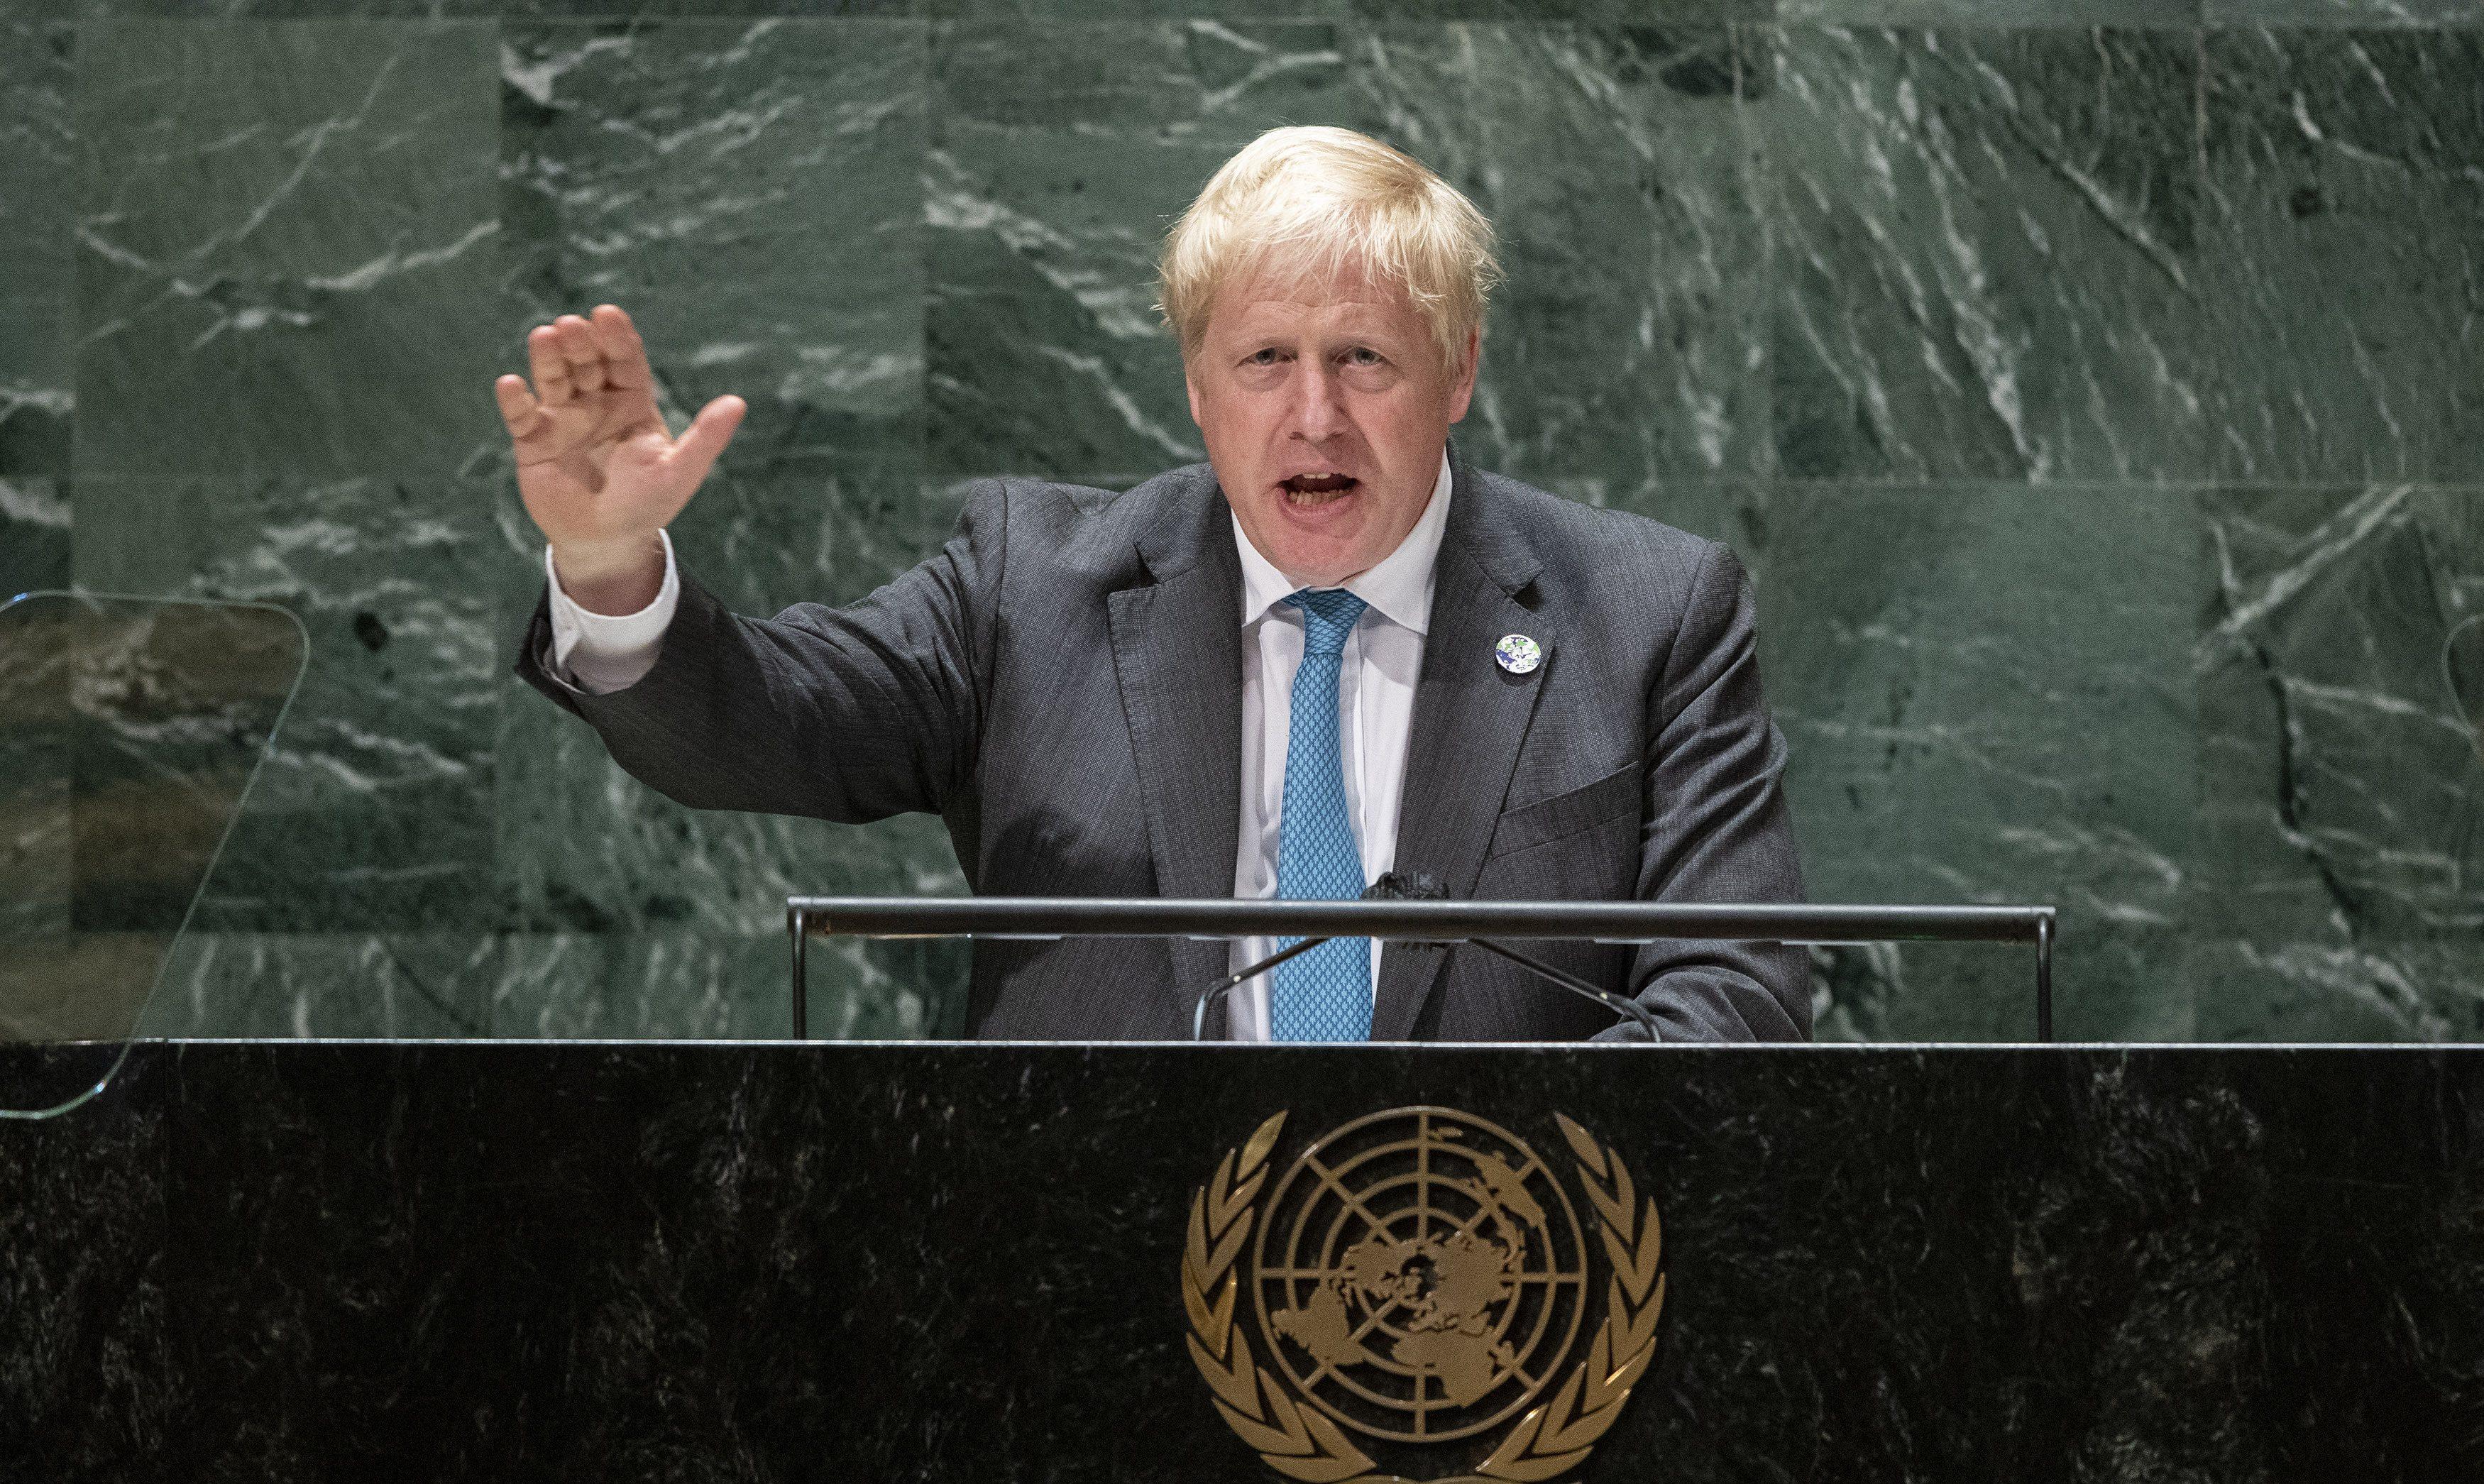 U.K.'s Boris Johnson says humanity needs to 'grow up,' face climate crisis at U.N.